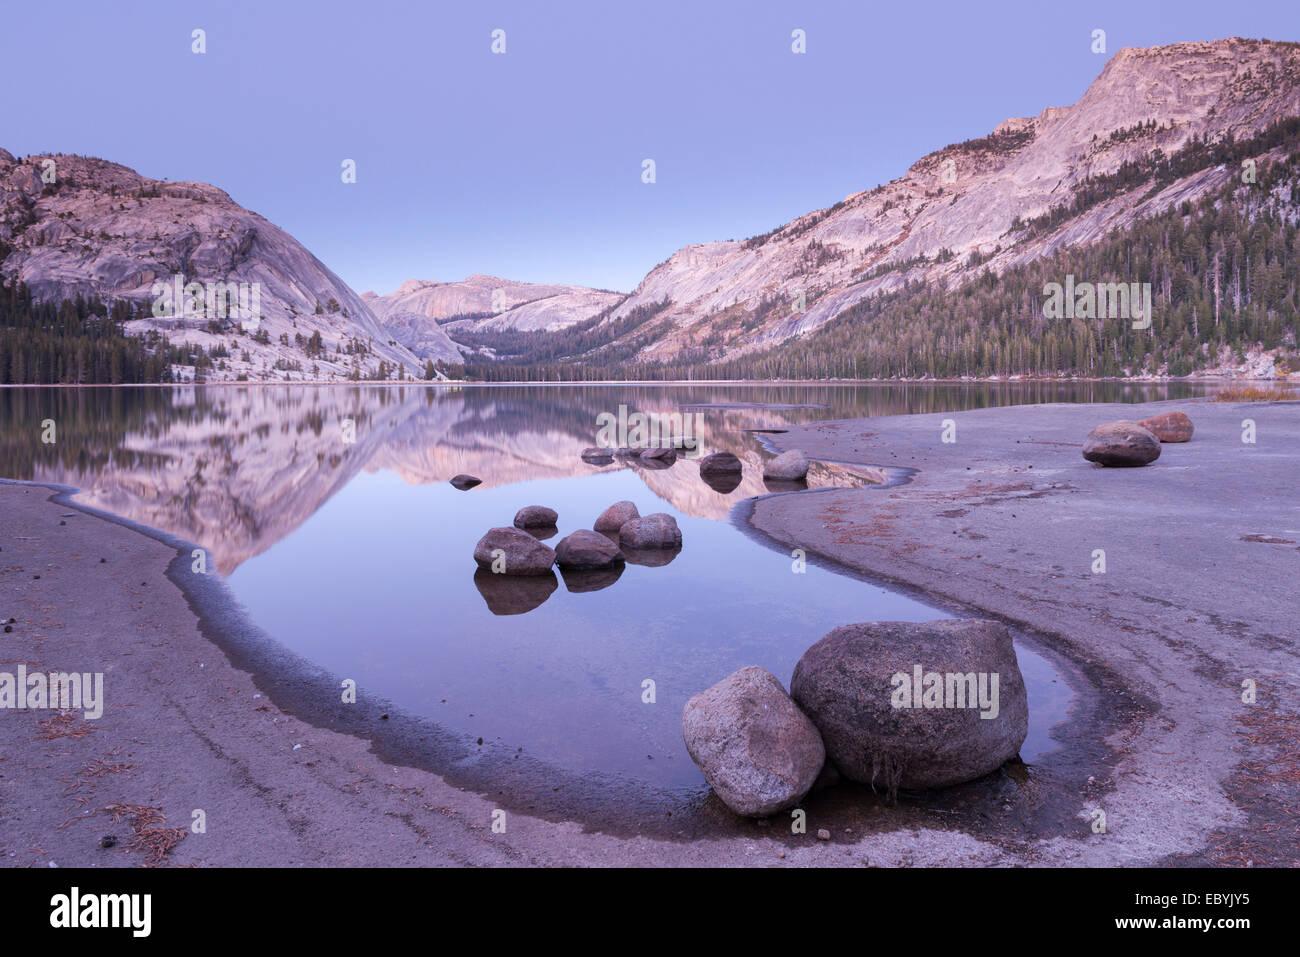 Dämmerung am Tenaya Lake, Yosemite-Nationalpark, Kalifornien, USA. Herbst (Oktober) 2013. Stockbild